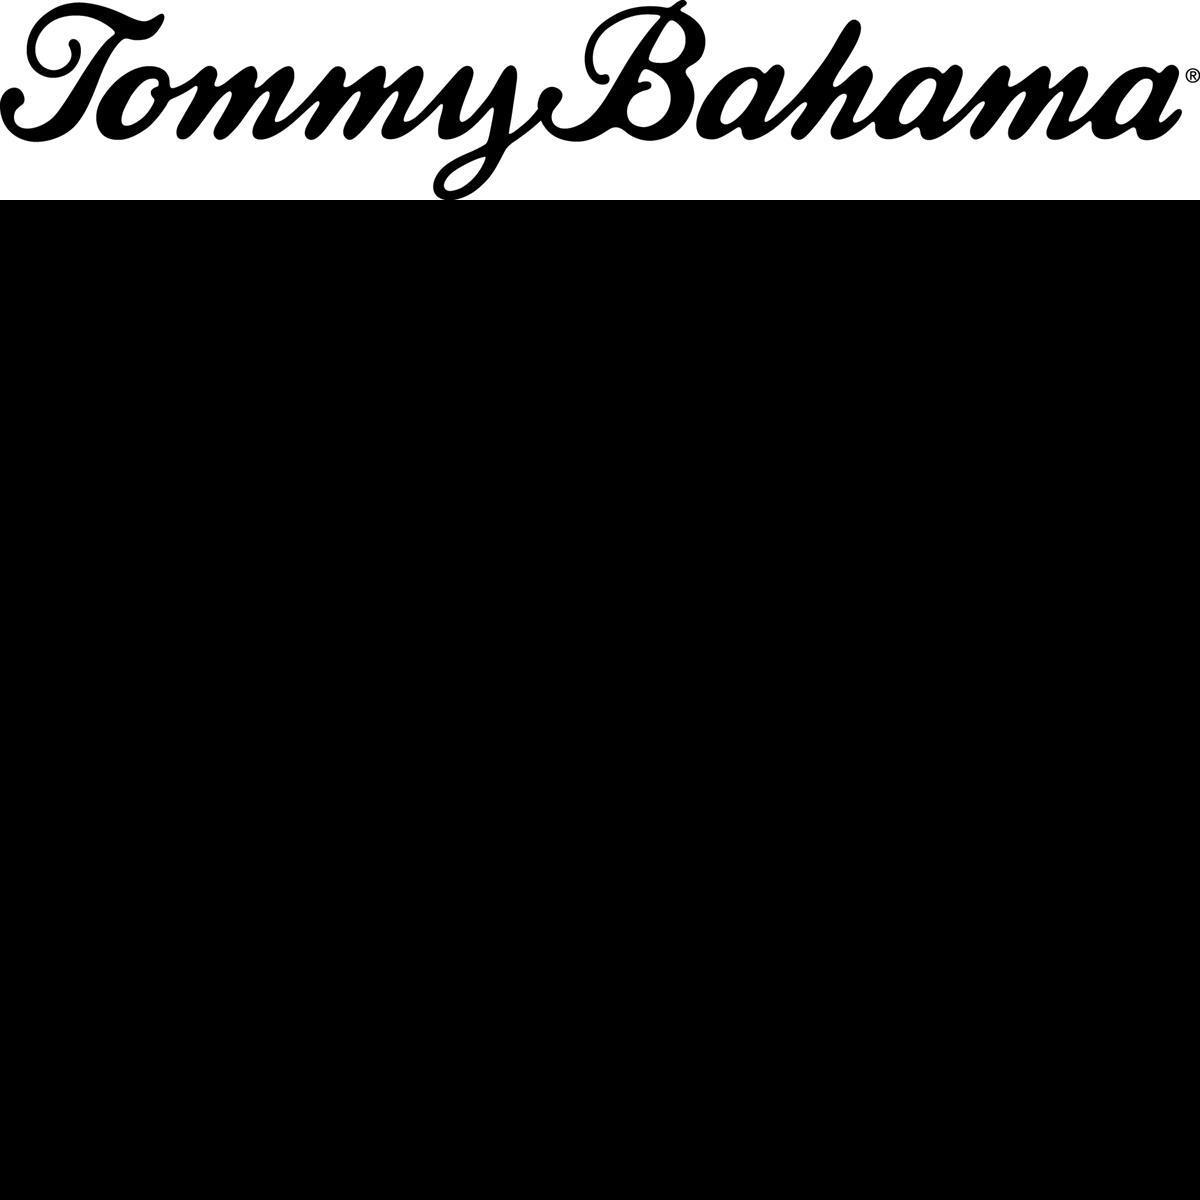 Tommy Bahama men's clothes jeans shirts cologne shoes